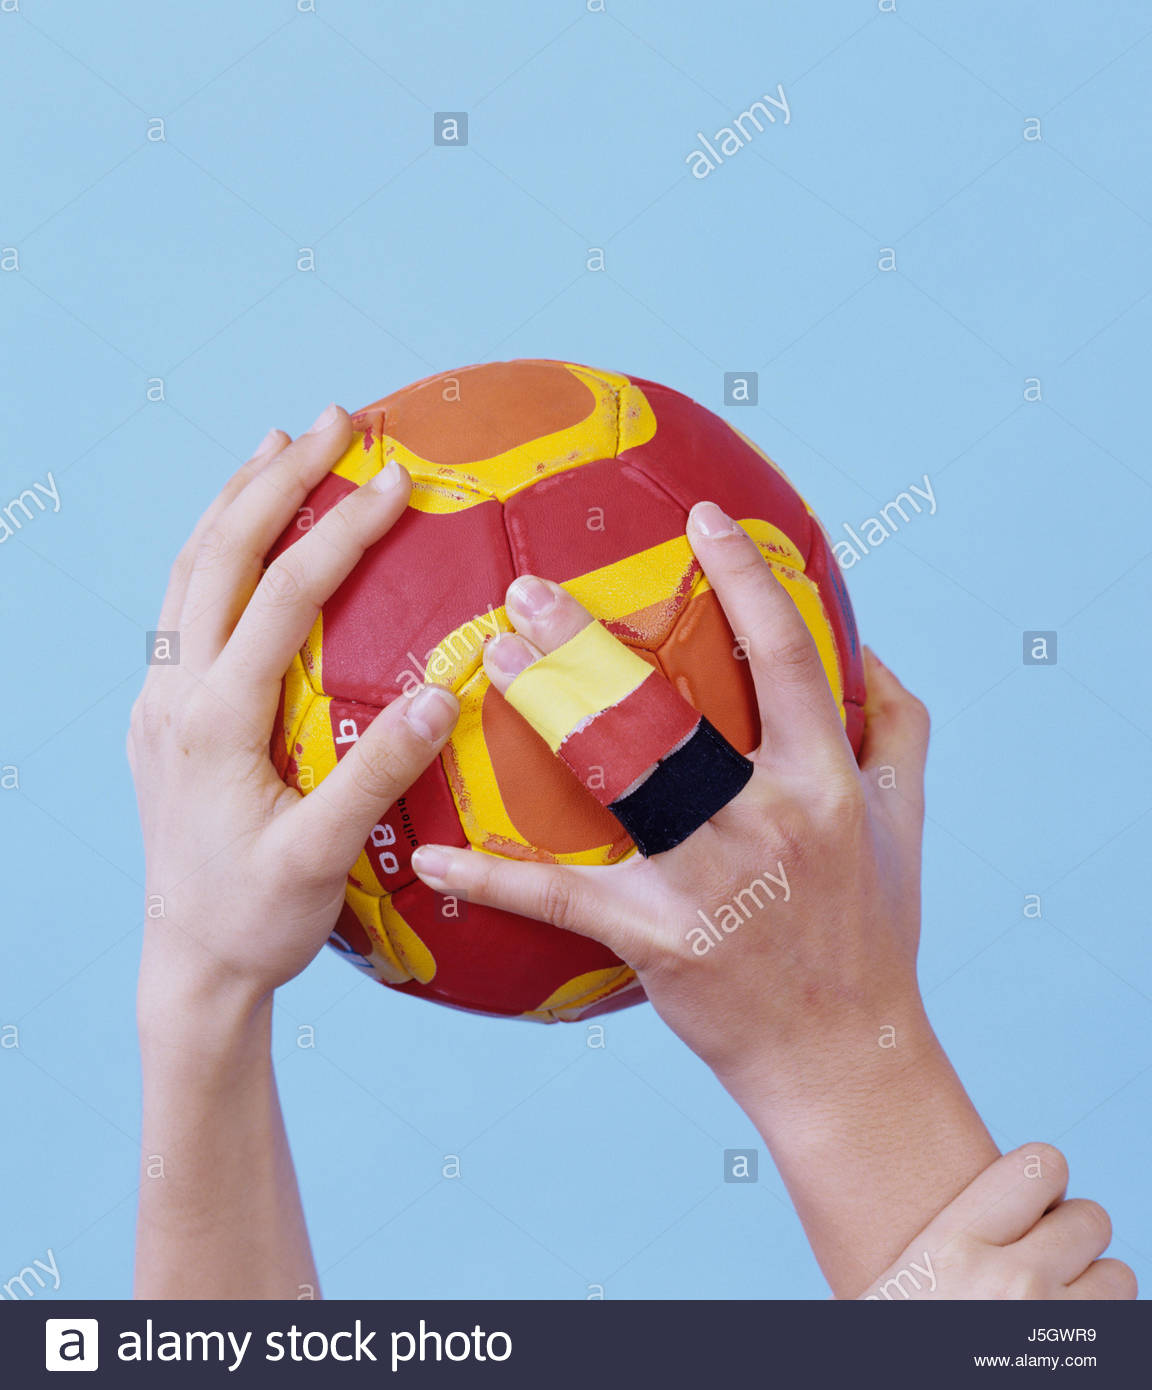 handball sports - Stock Image